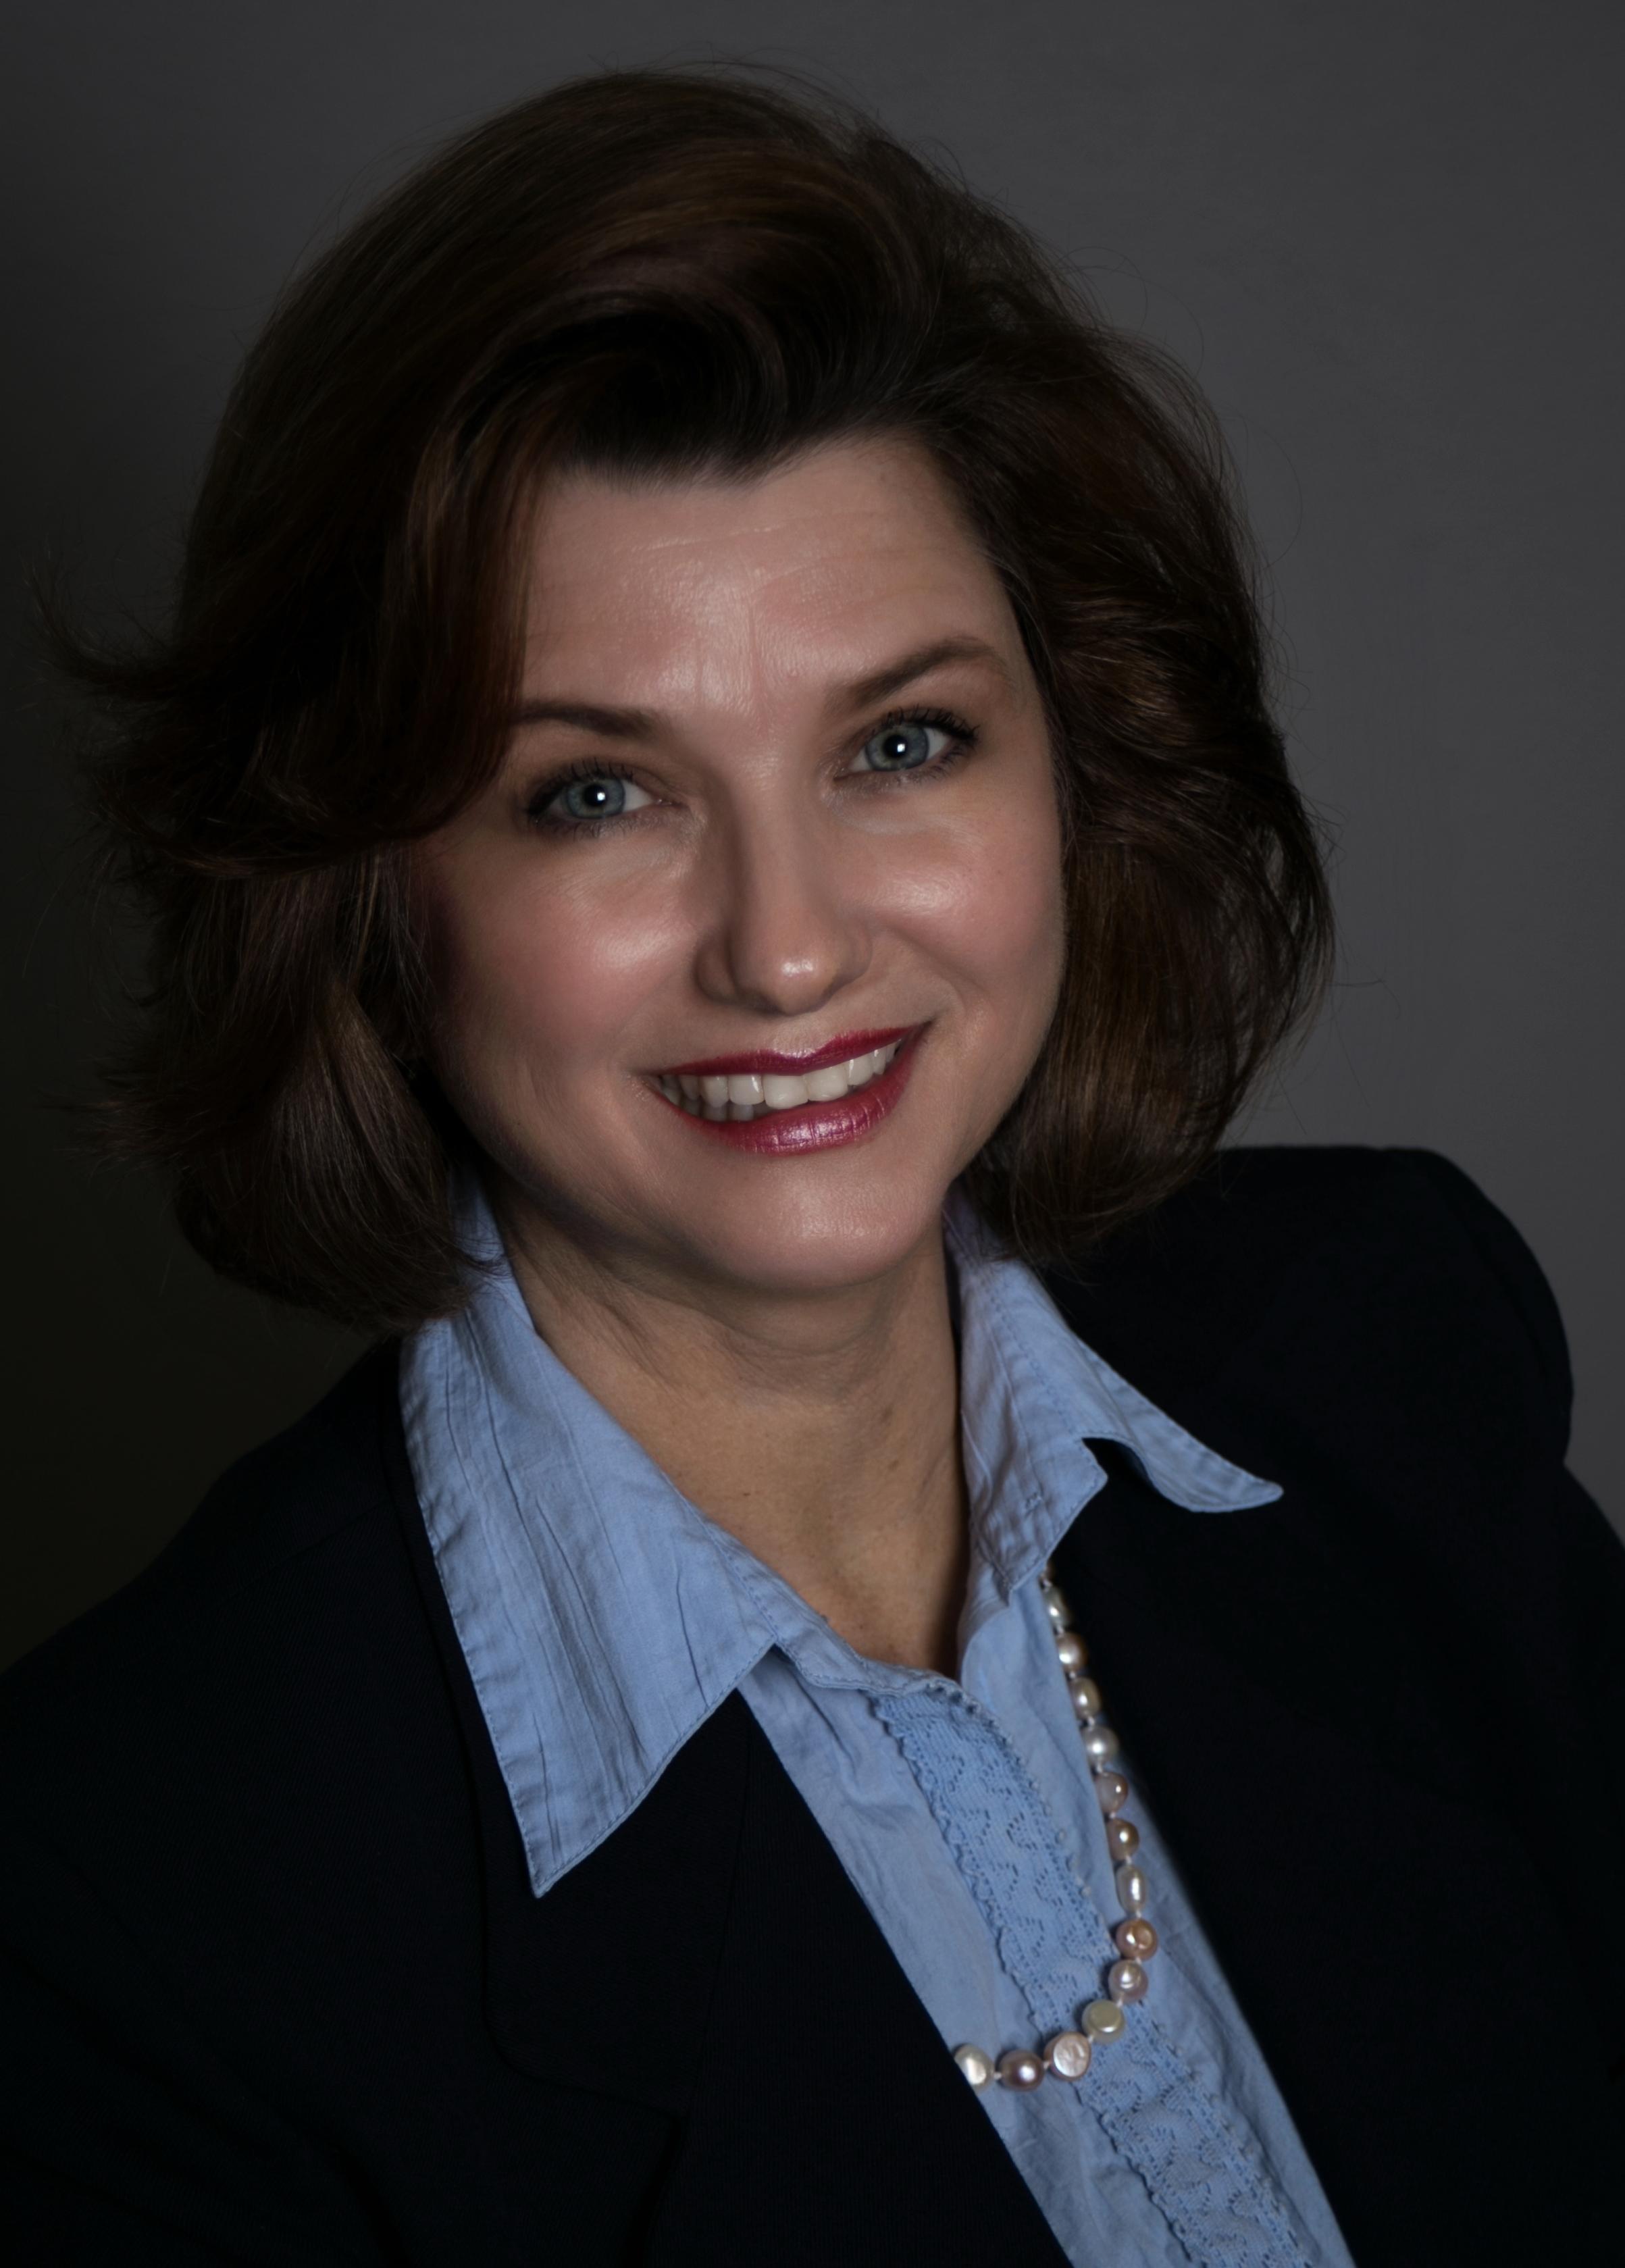 Jennifer Allen Net Worth